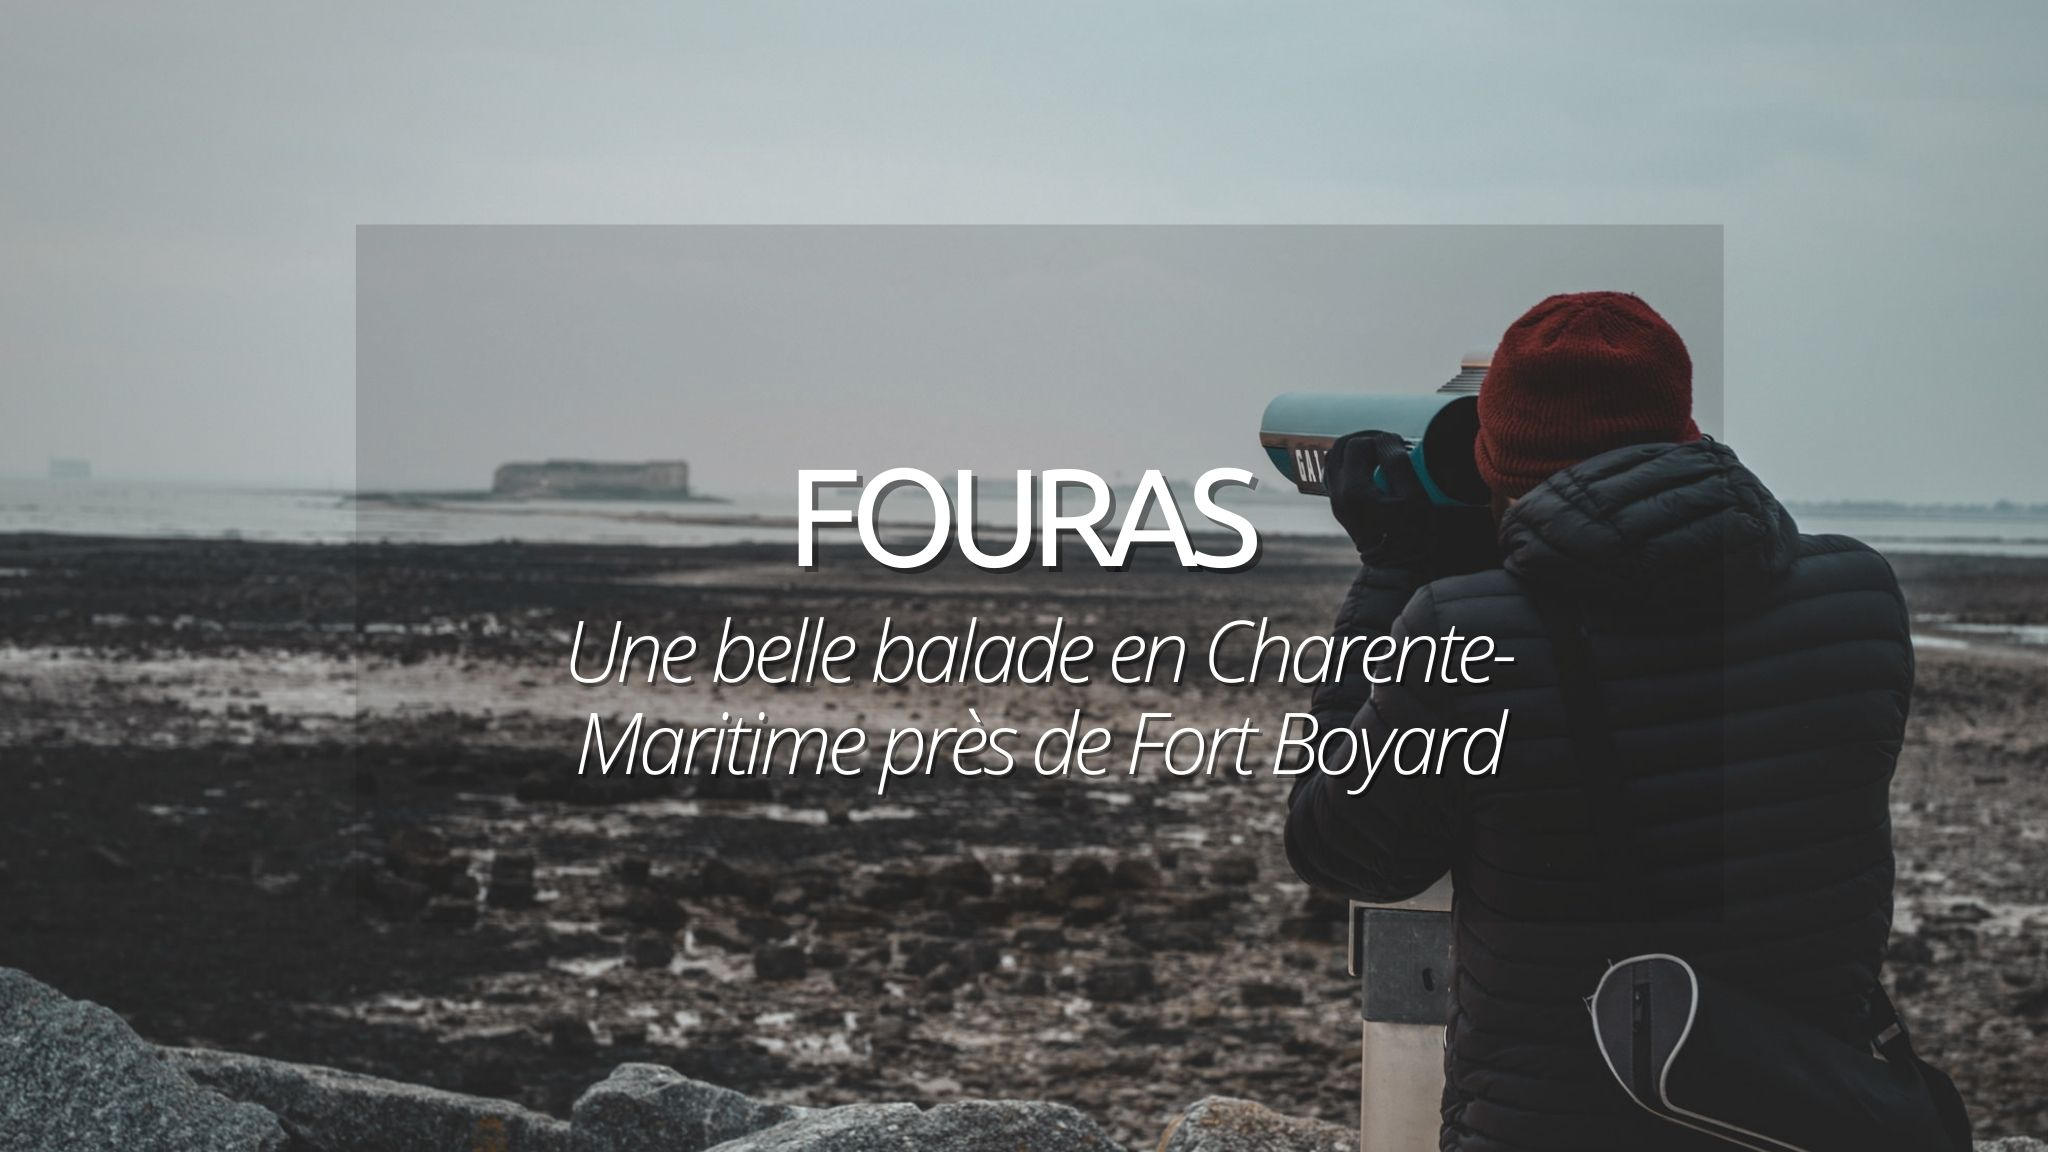 Visiter Fouras : promenade ostréicole en Charente Maritime